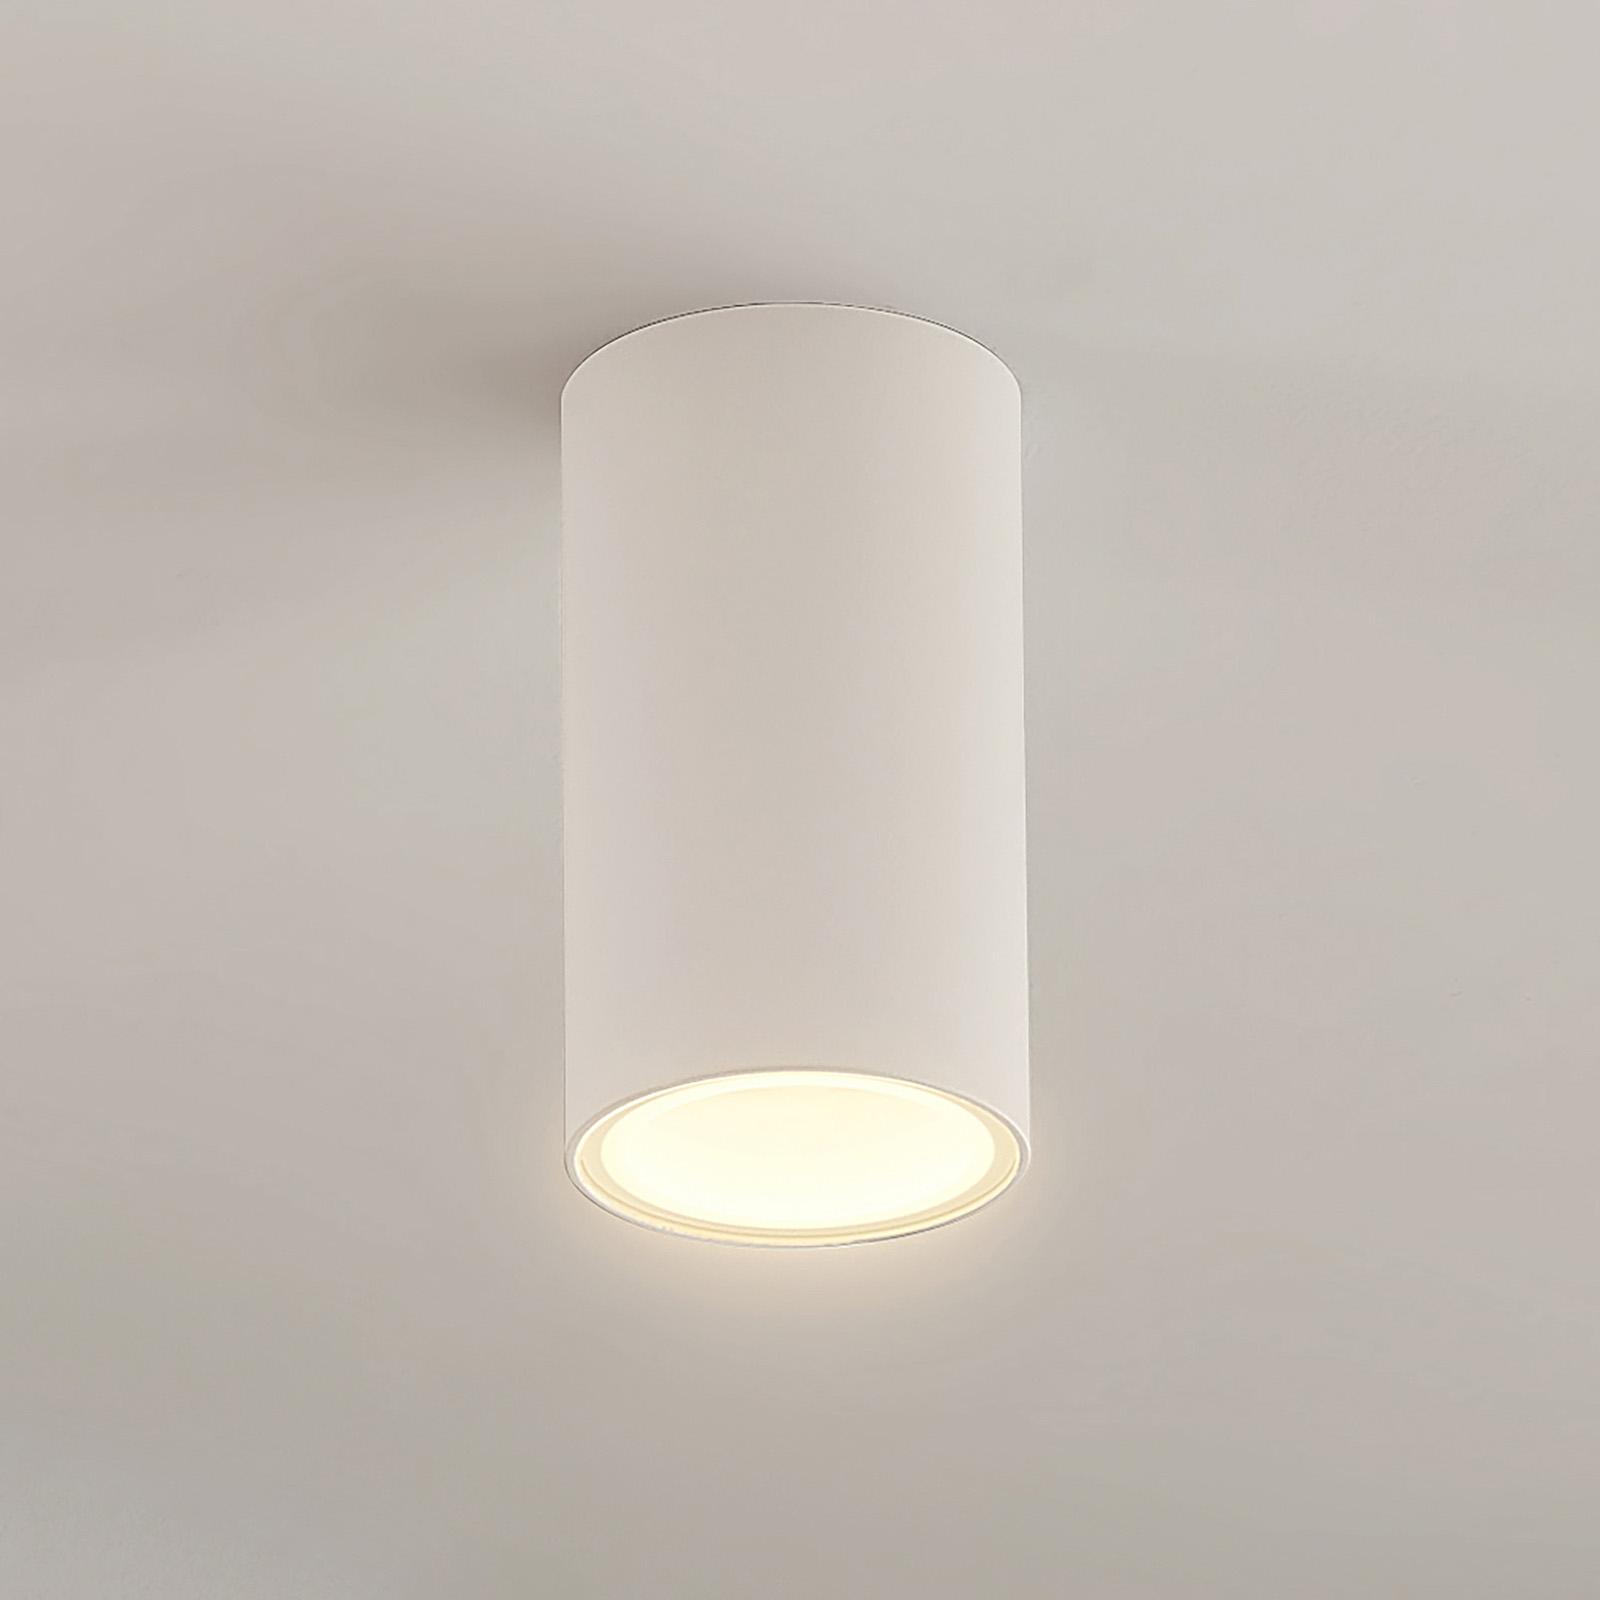 Arcchio Olivir downlight, redondo, GU10, blanco